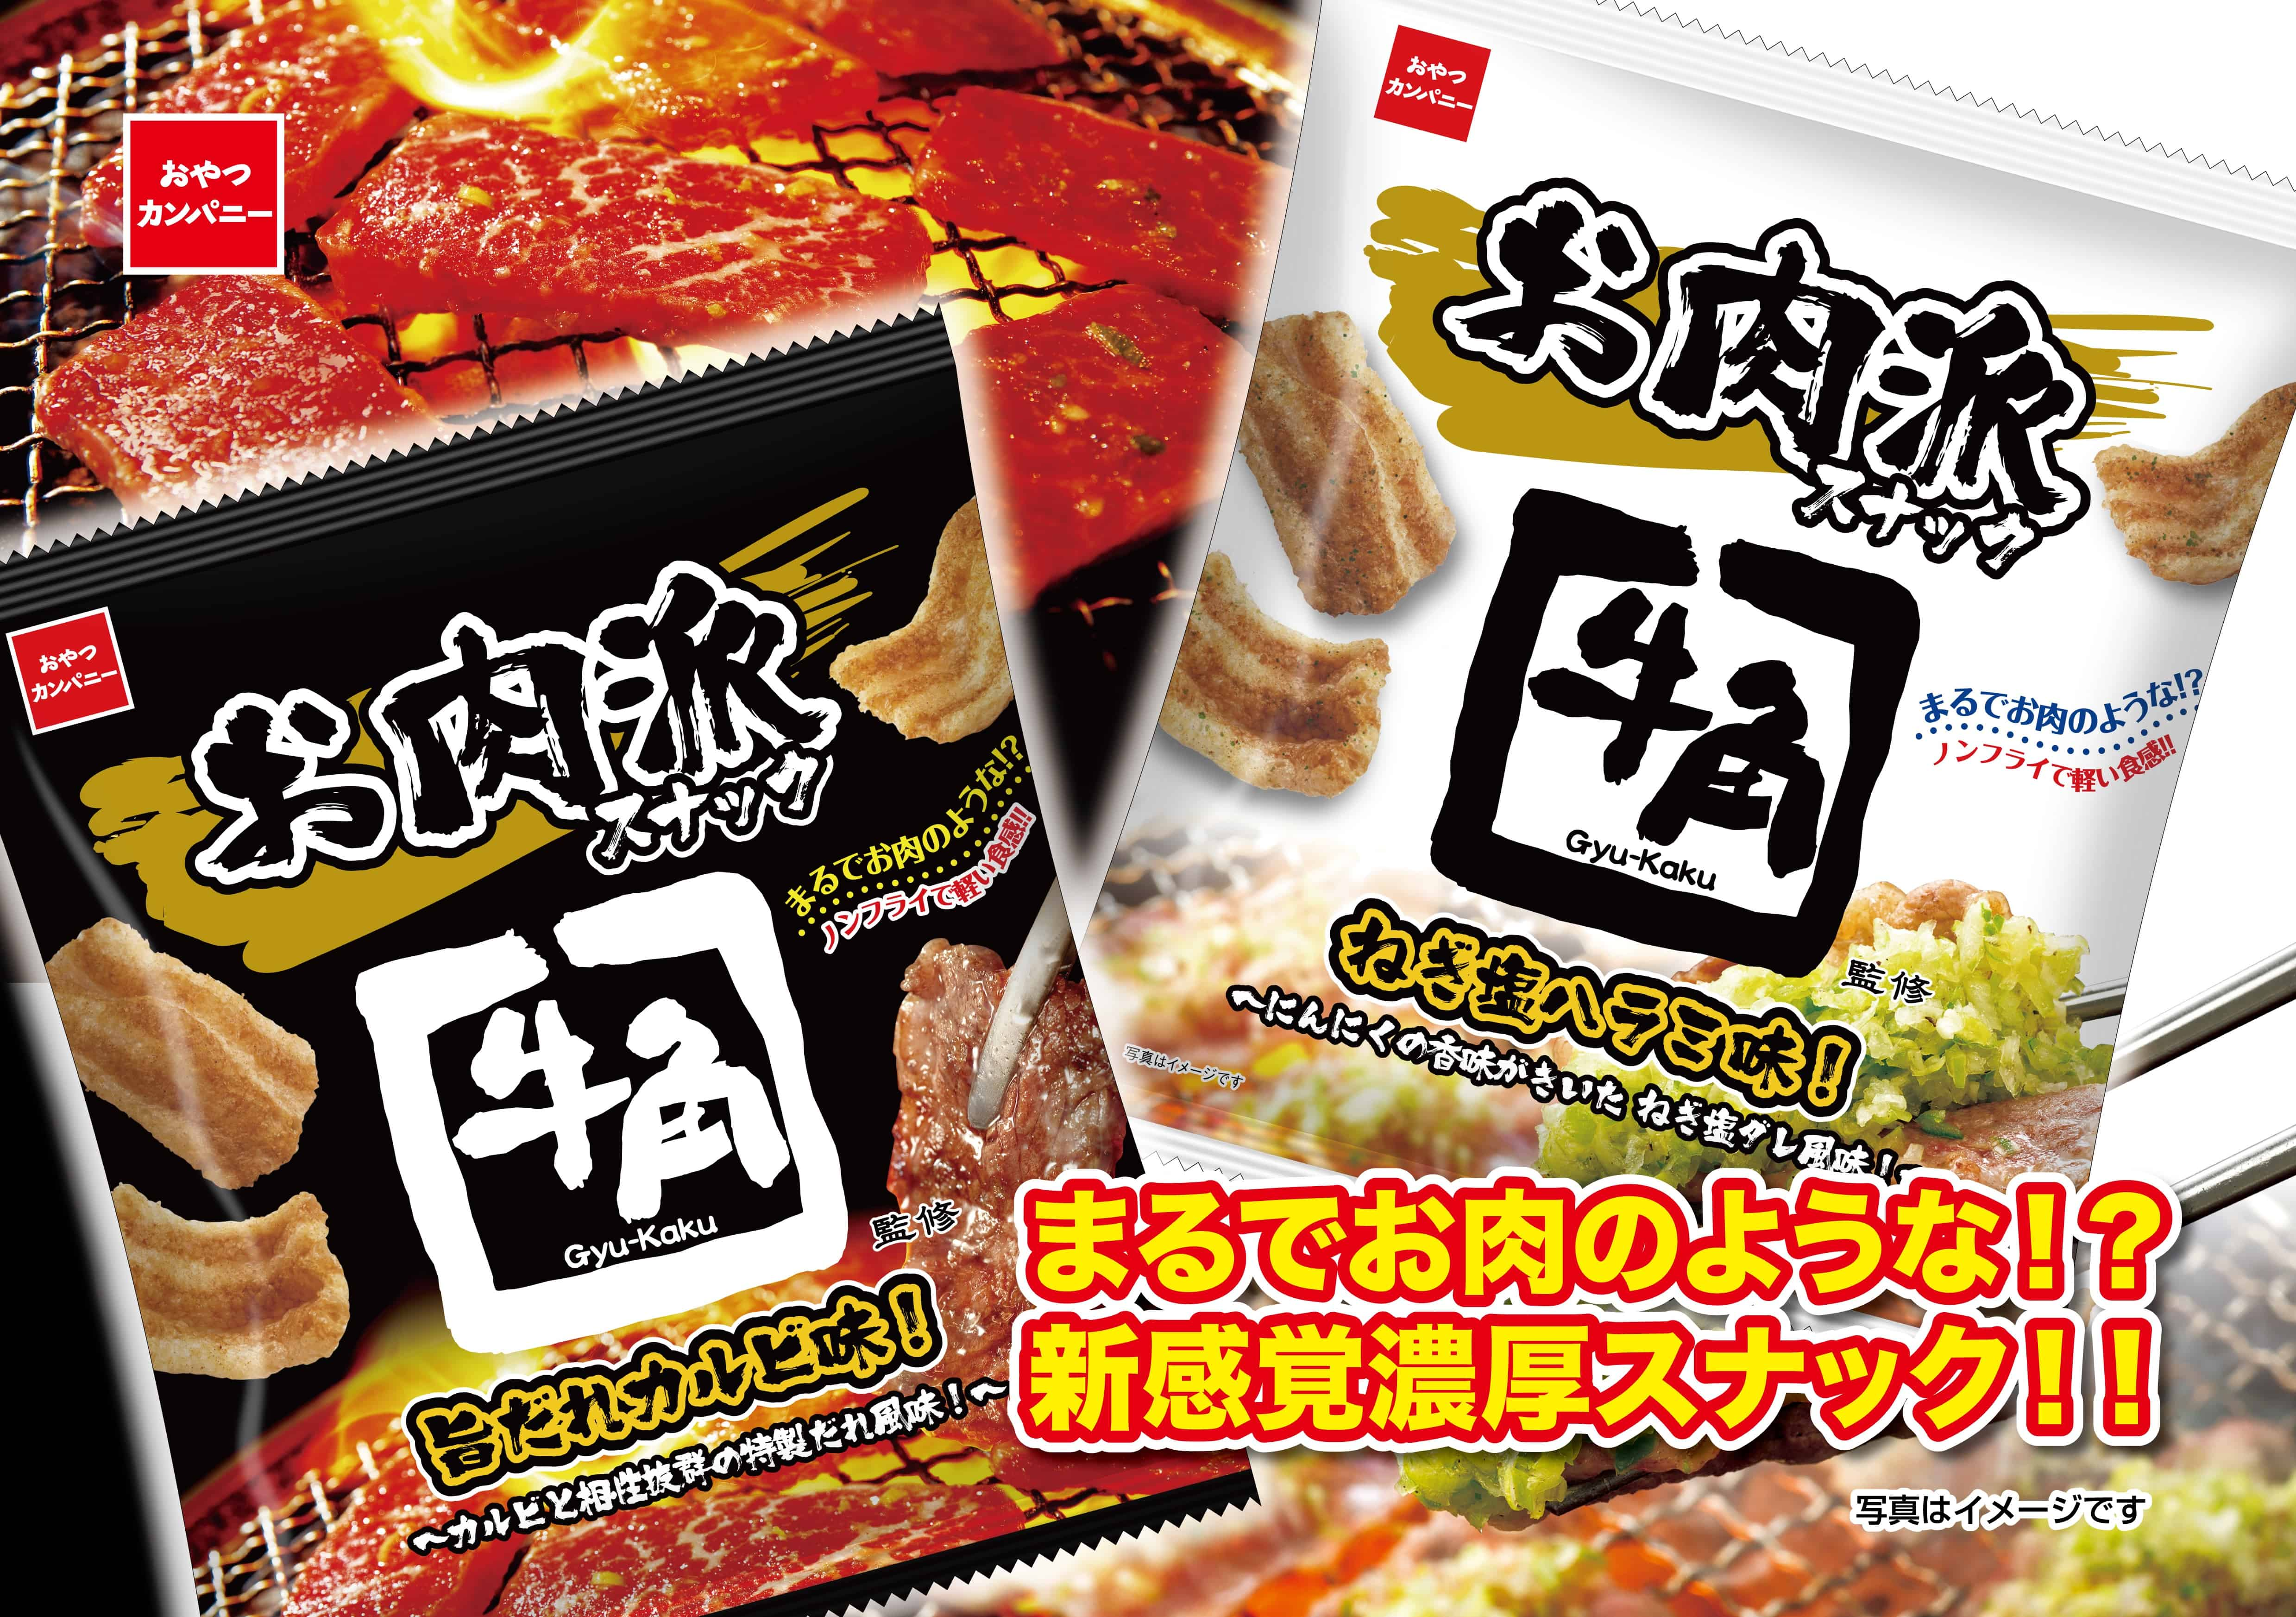 Gyu-Kaku Snack ขนมรสเนื้อคารุบิและรสฮารามิจากญี่ปุ่น